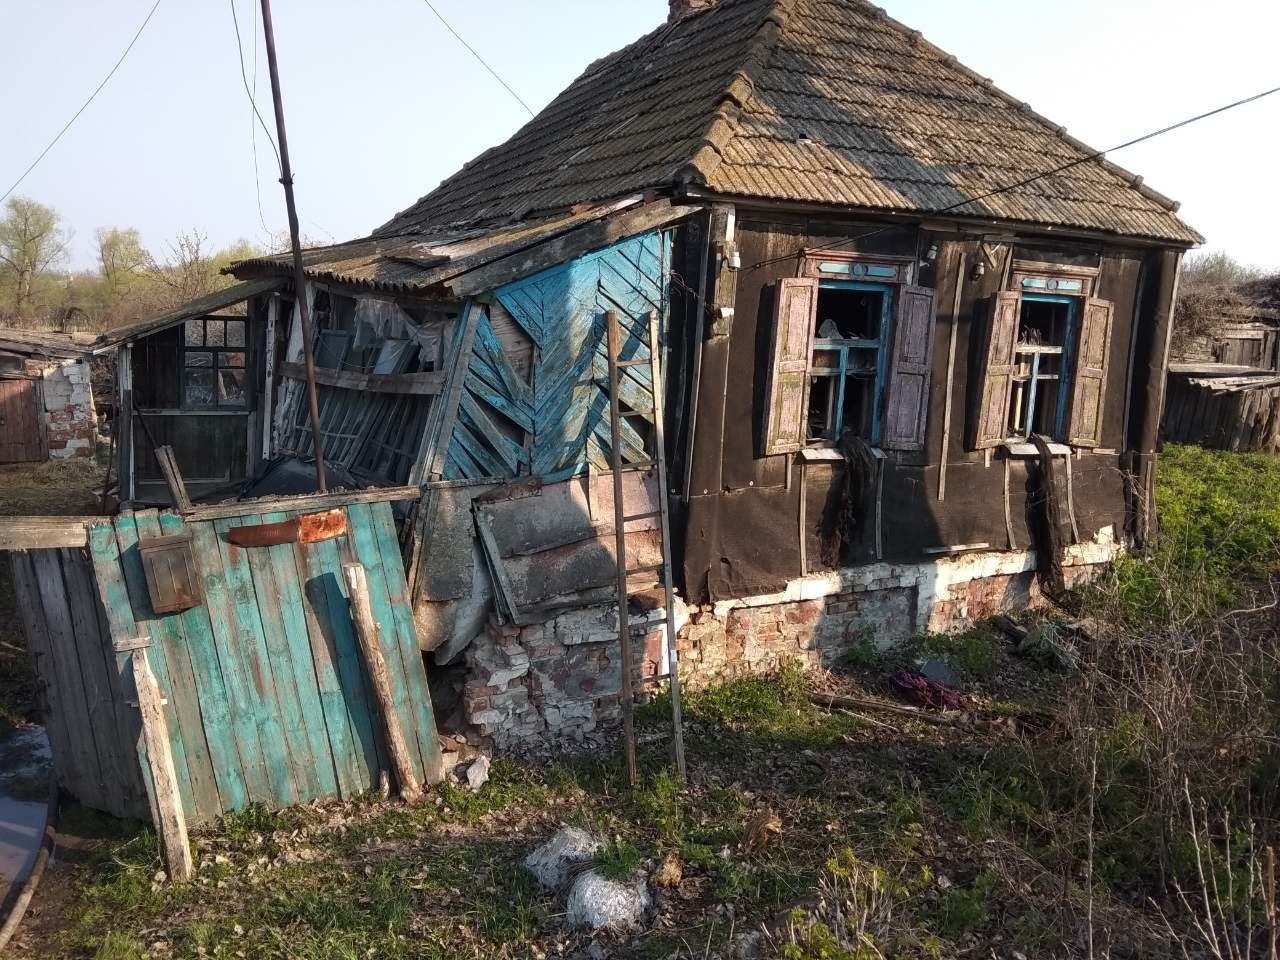 На Харьковщине во время пожара погиб пенсионер, - ФОТО, фото-2